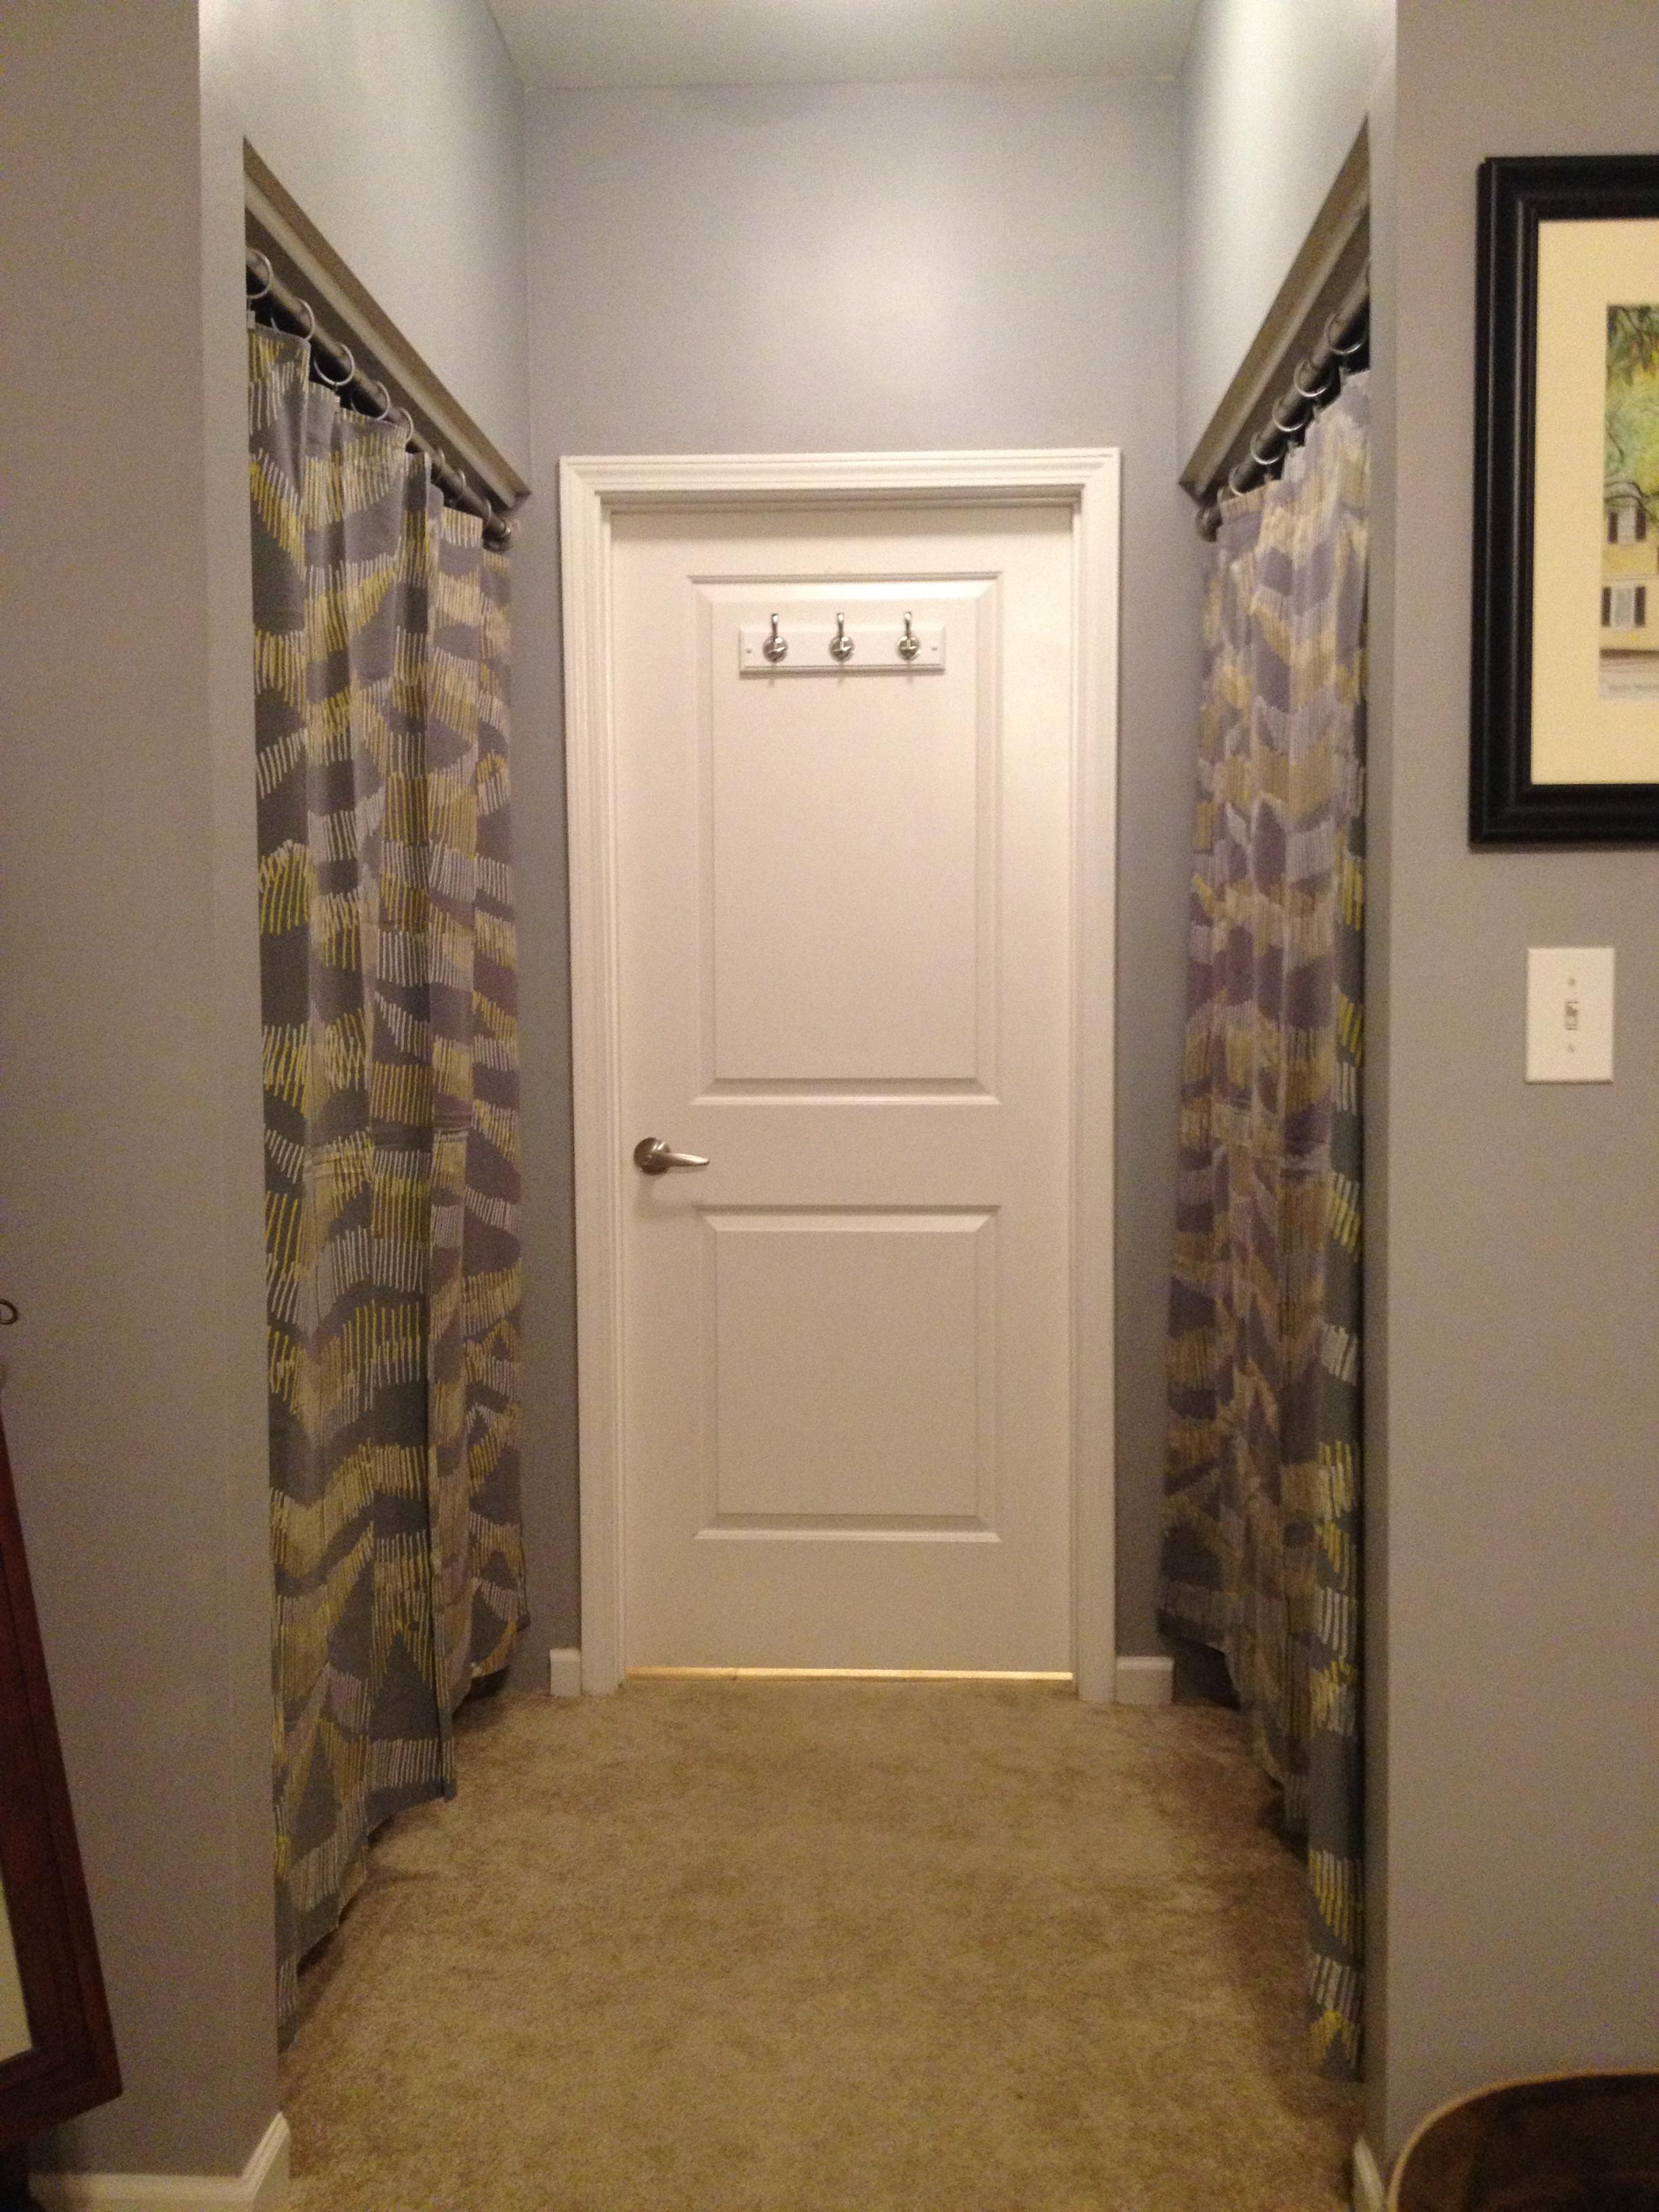 Curtains for closet doors - Closet Curtain Charleston Crafted